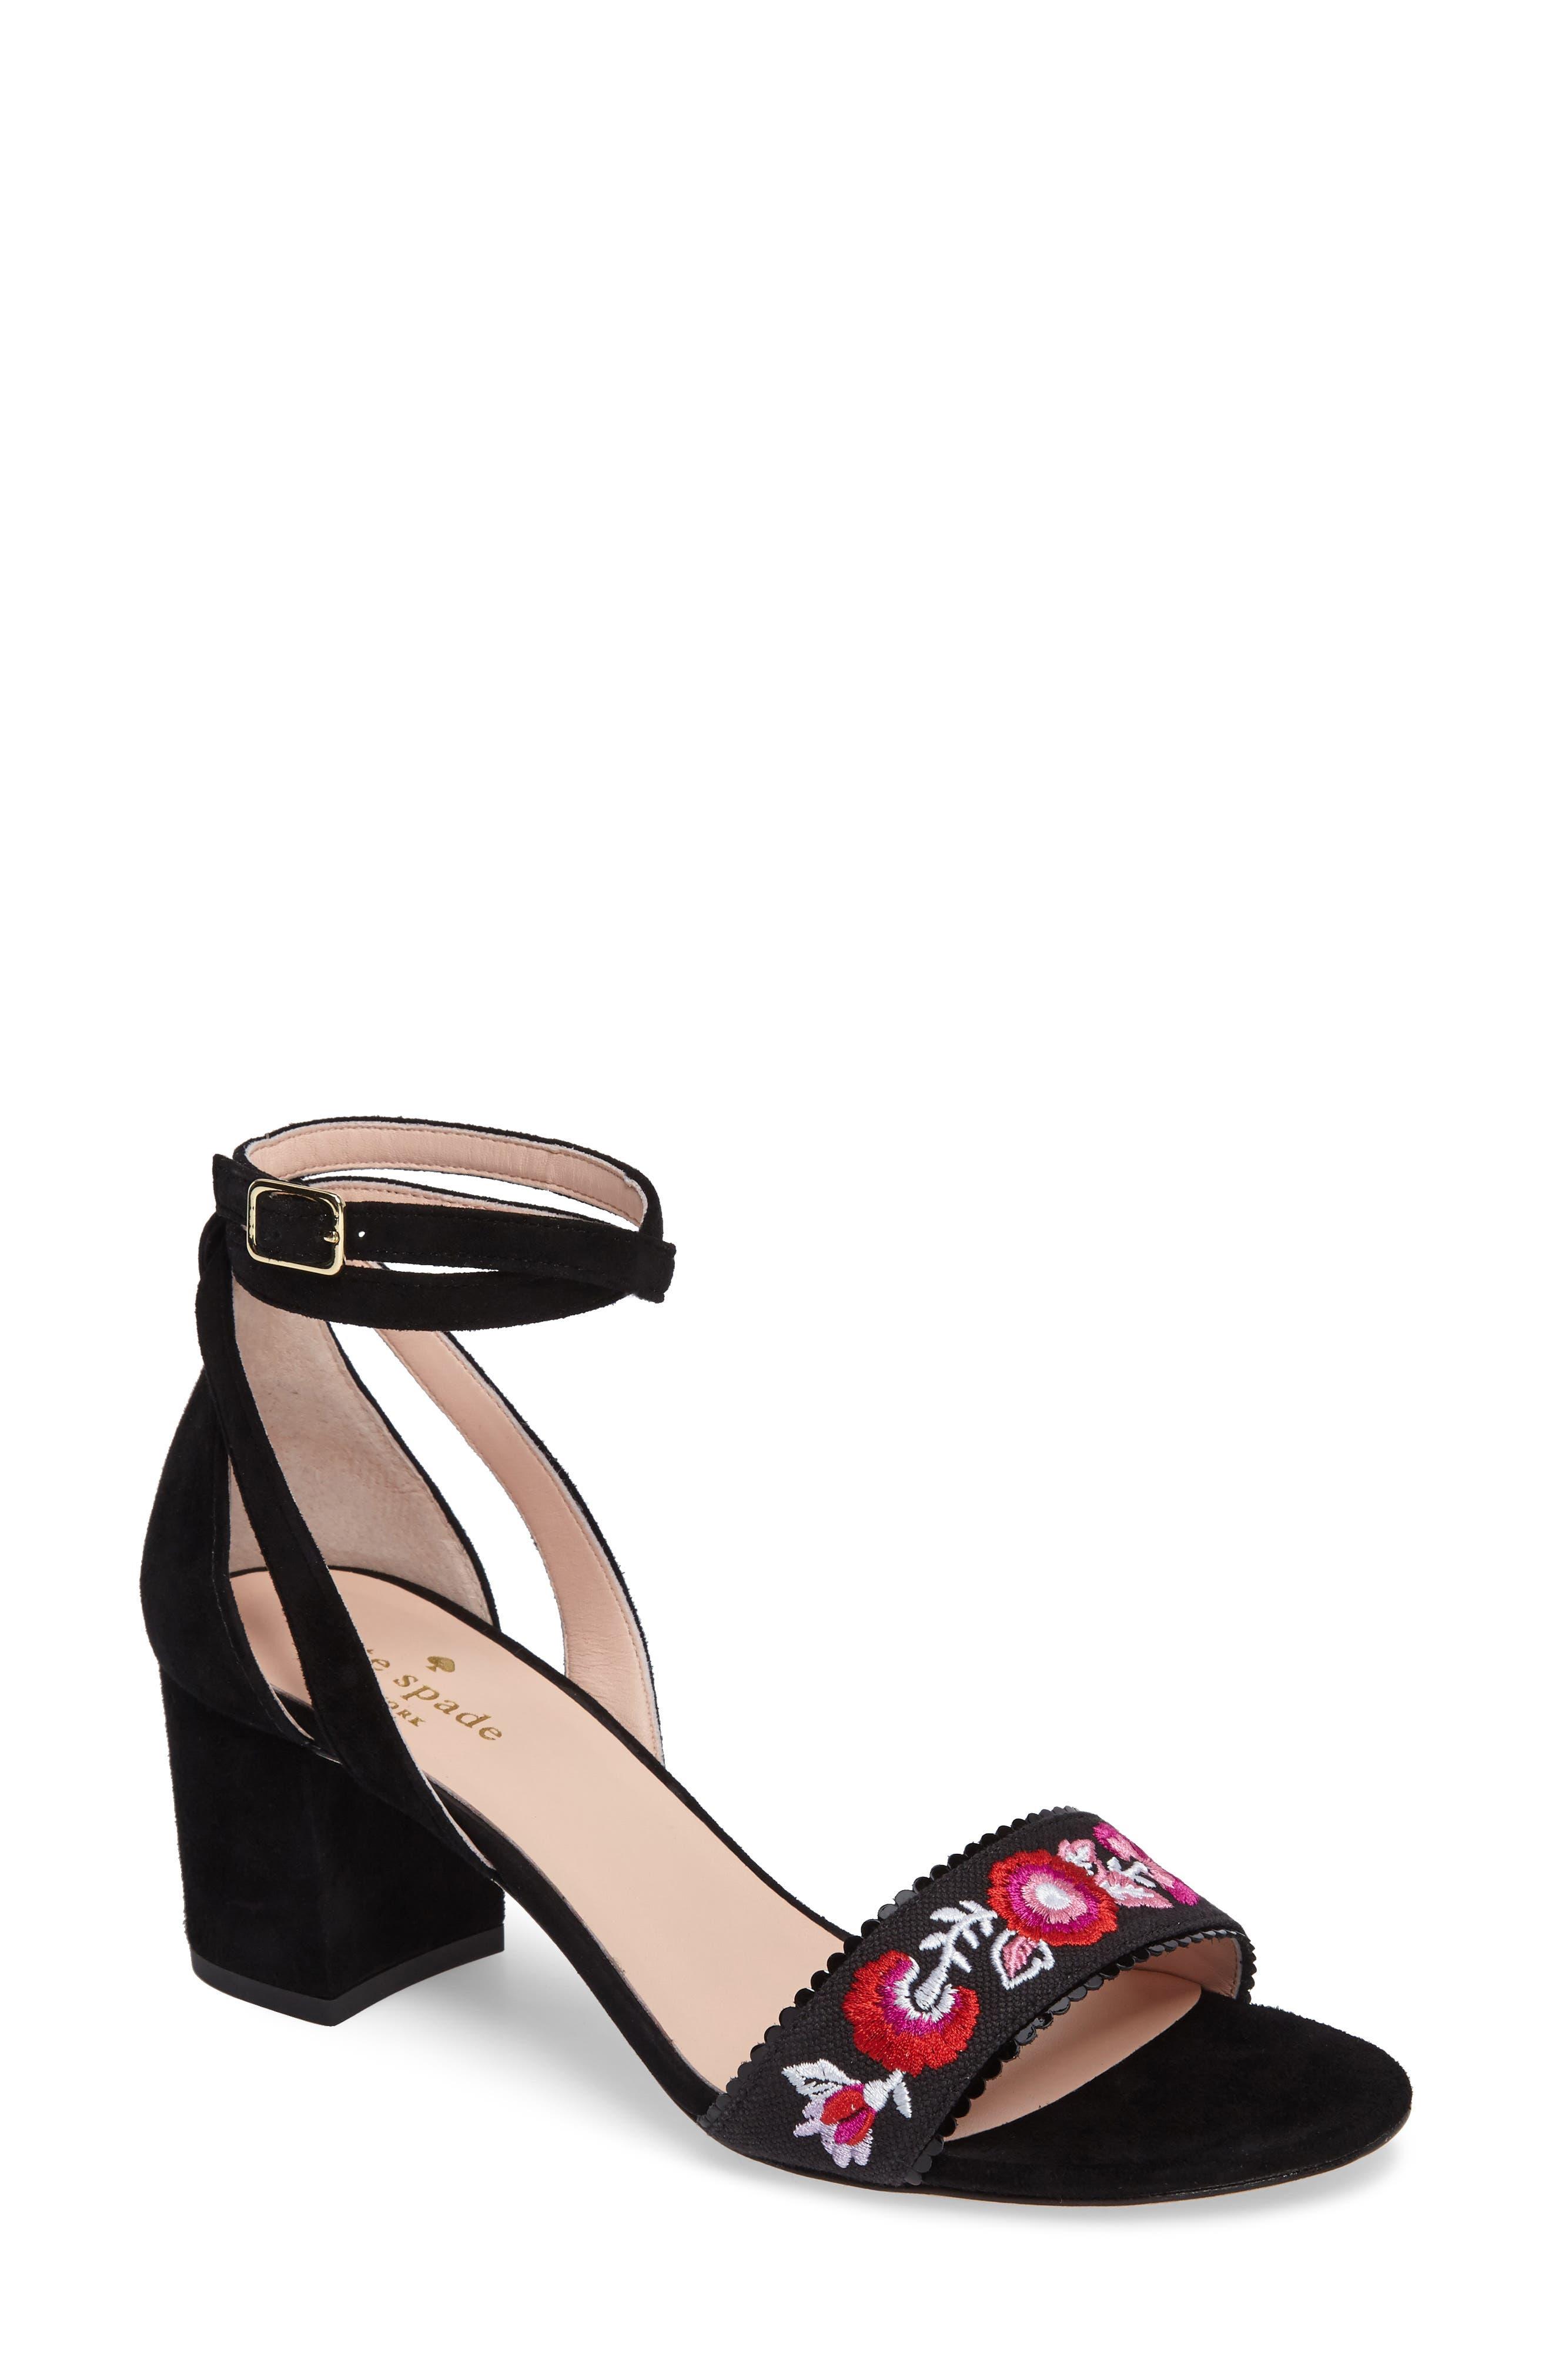 watson genuine calf hair block heel sandal,                             Main thumbnail 1, color,                             001